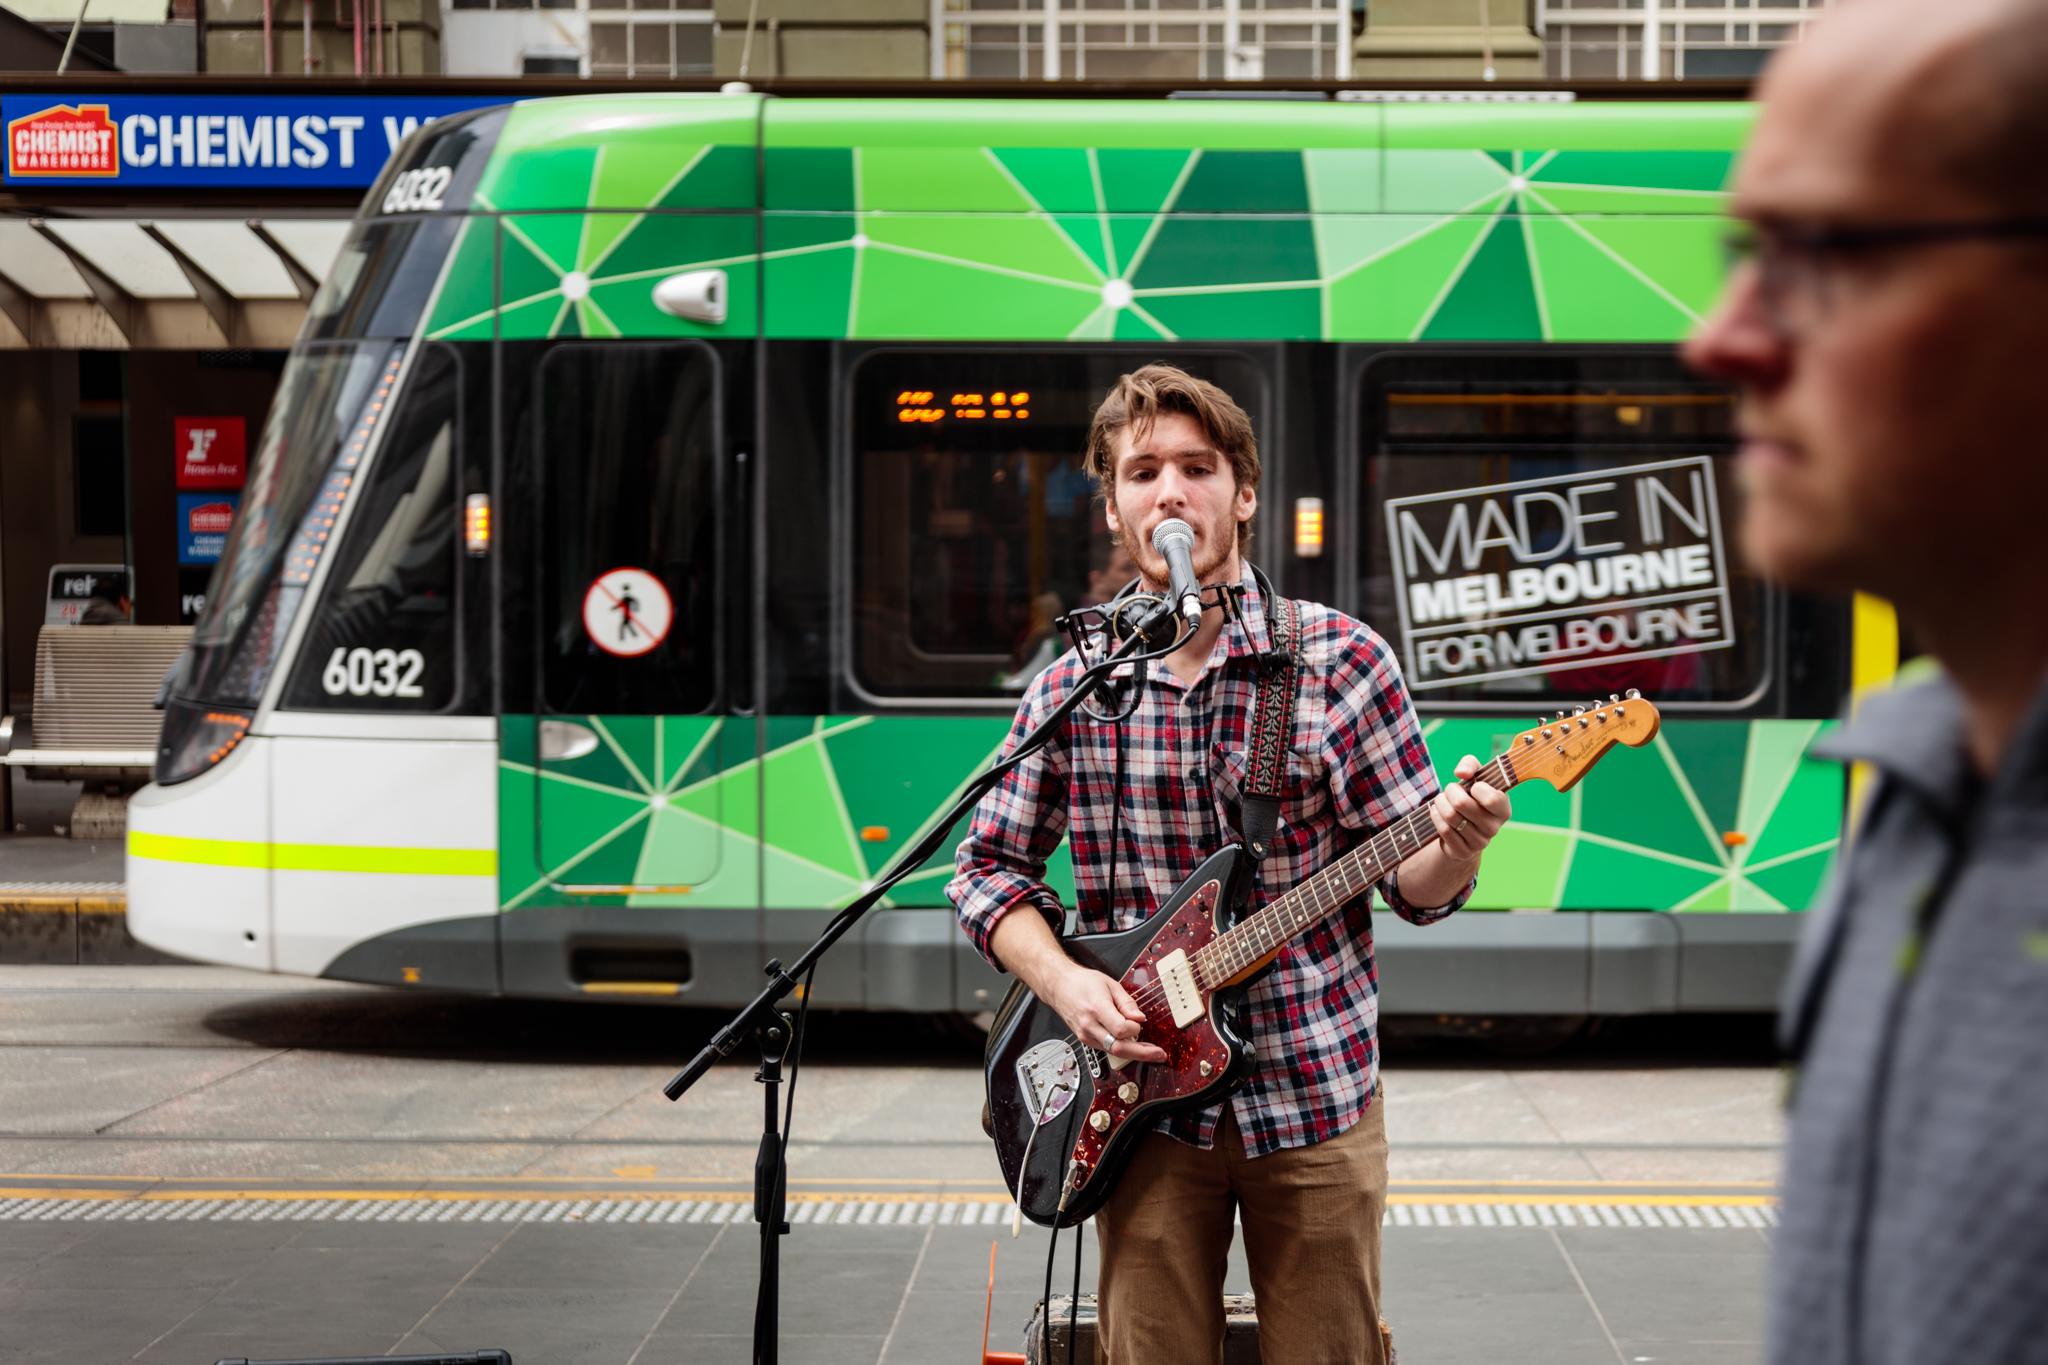 tram-street-singer-made-in-melbourne.jpg